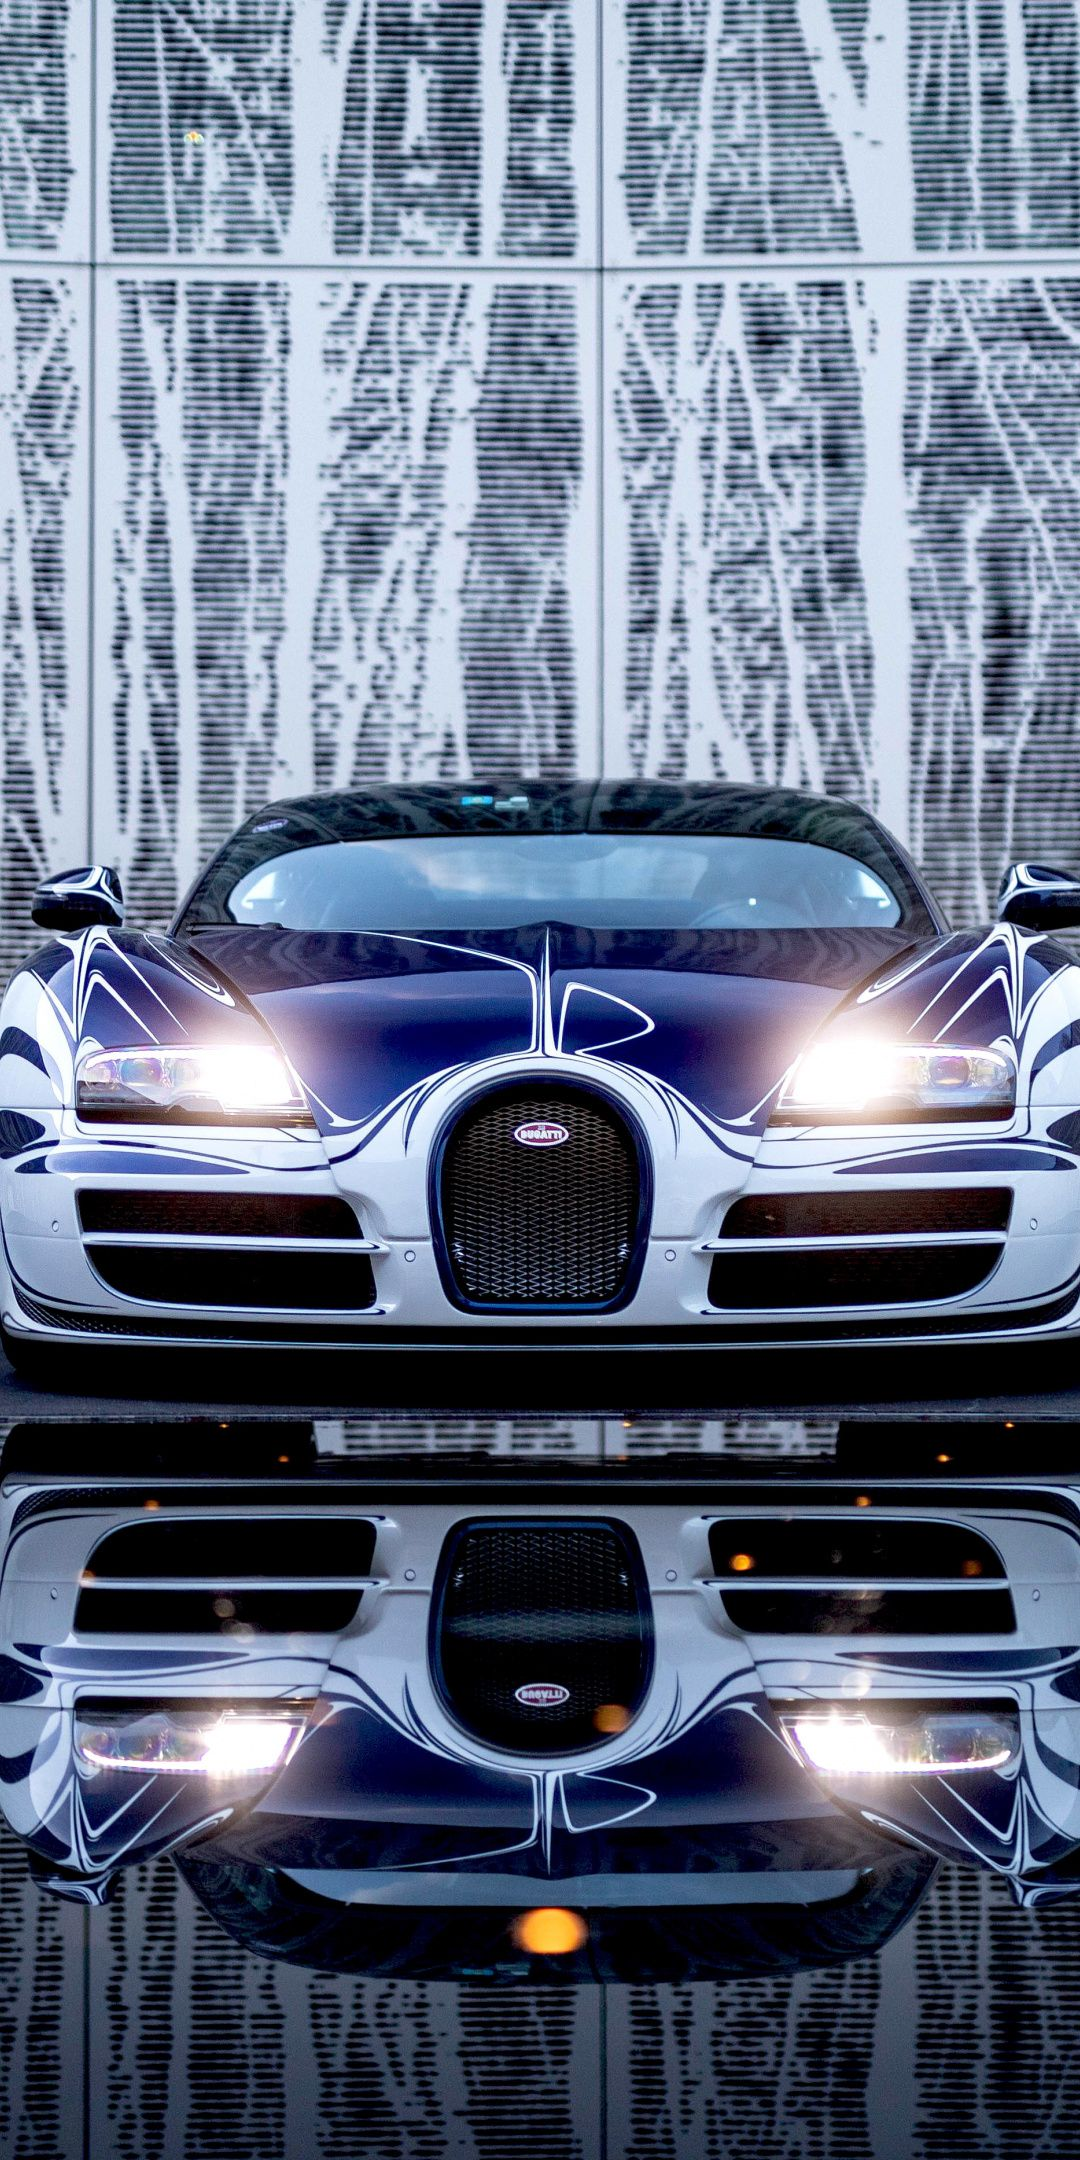 1080x2160 Bugatti Veyron Grand Sport Roadster Front Luxury Car Wallpaper Bugatti Veyron Cars Bugatti Veyron Veyron